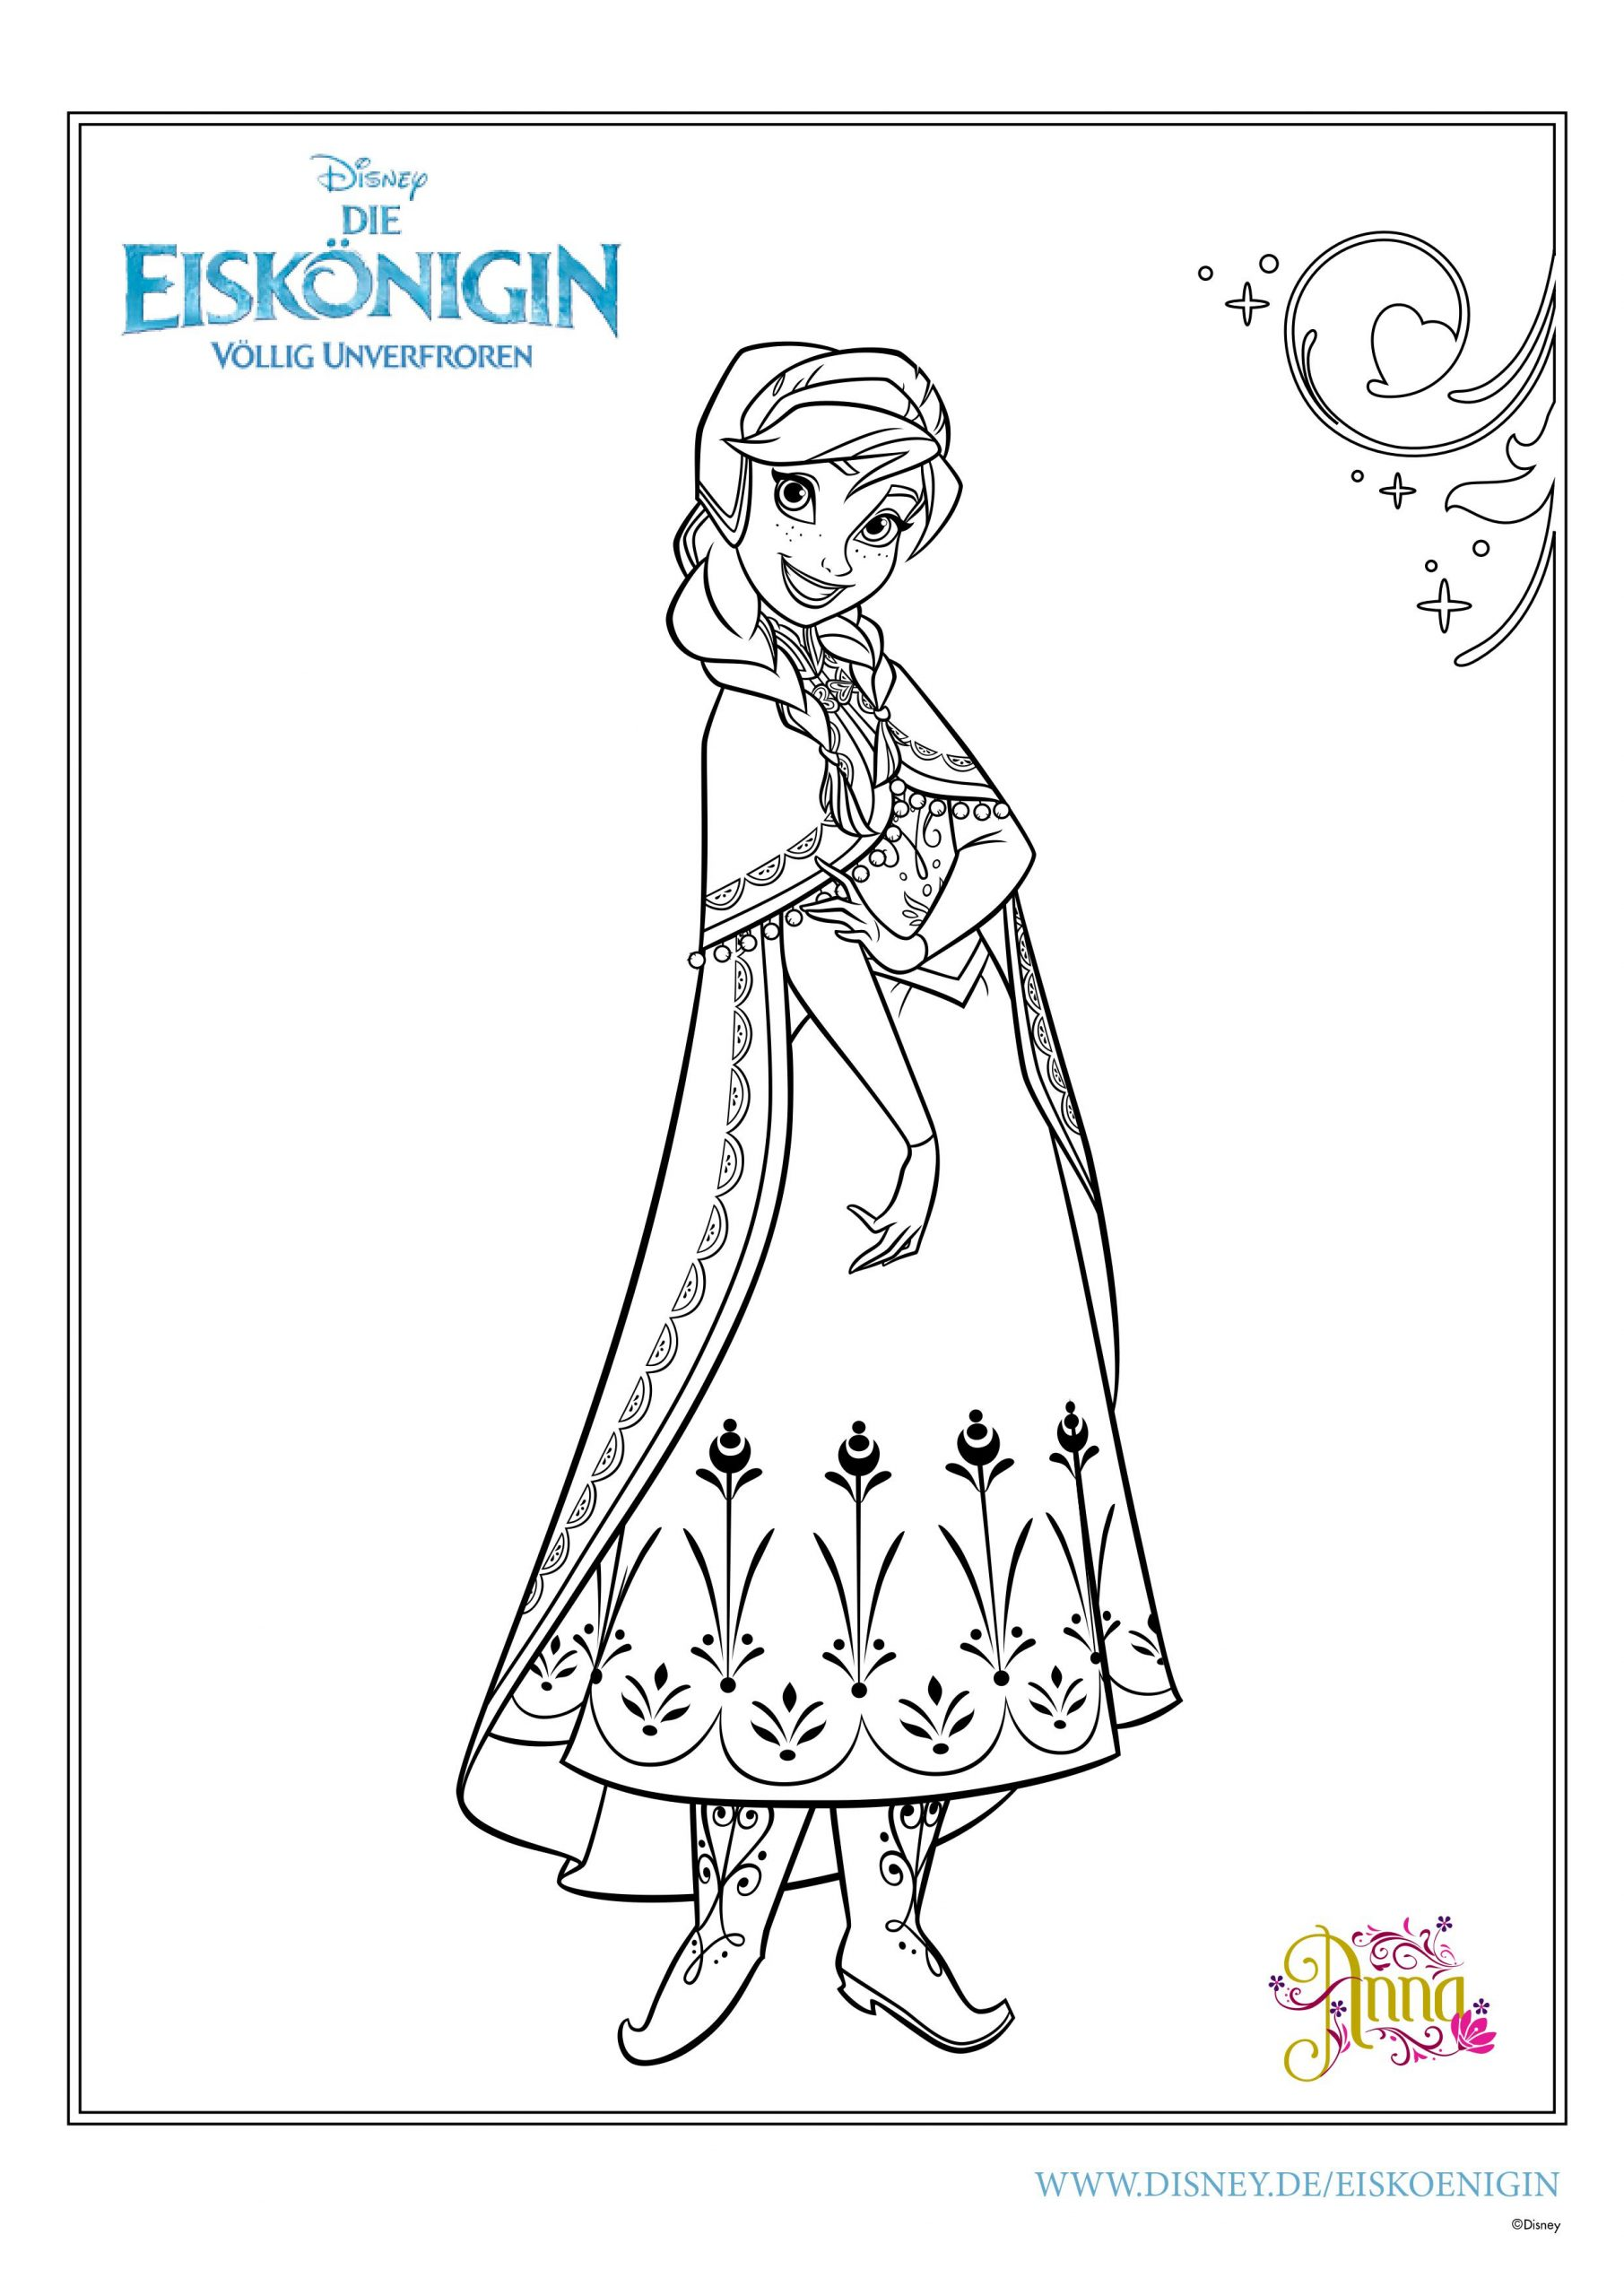 Ausmalbilder Eiskönigin   Mytoys-Blog in Ausmalbilder Anna Und Elsa